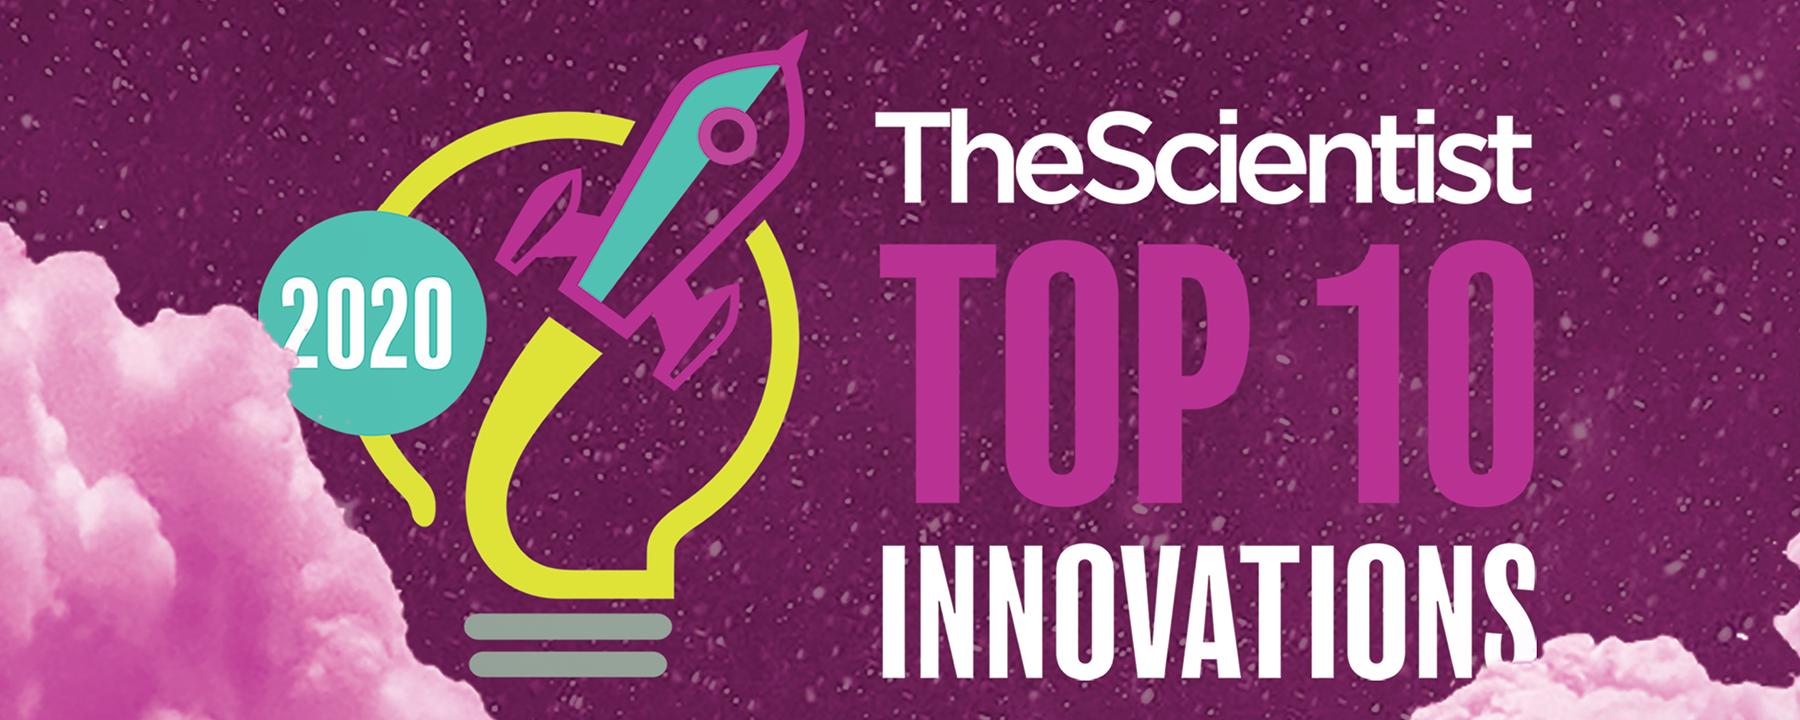 2020 Top 10 Innovations